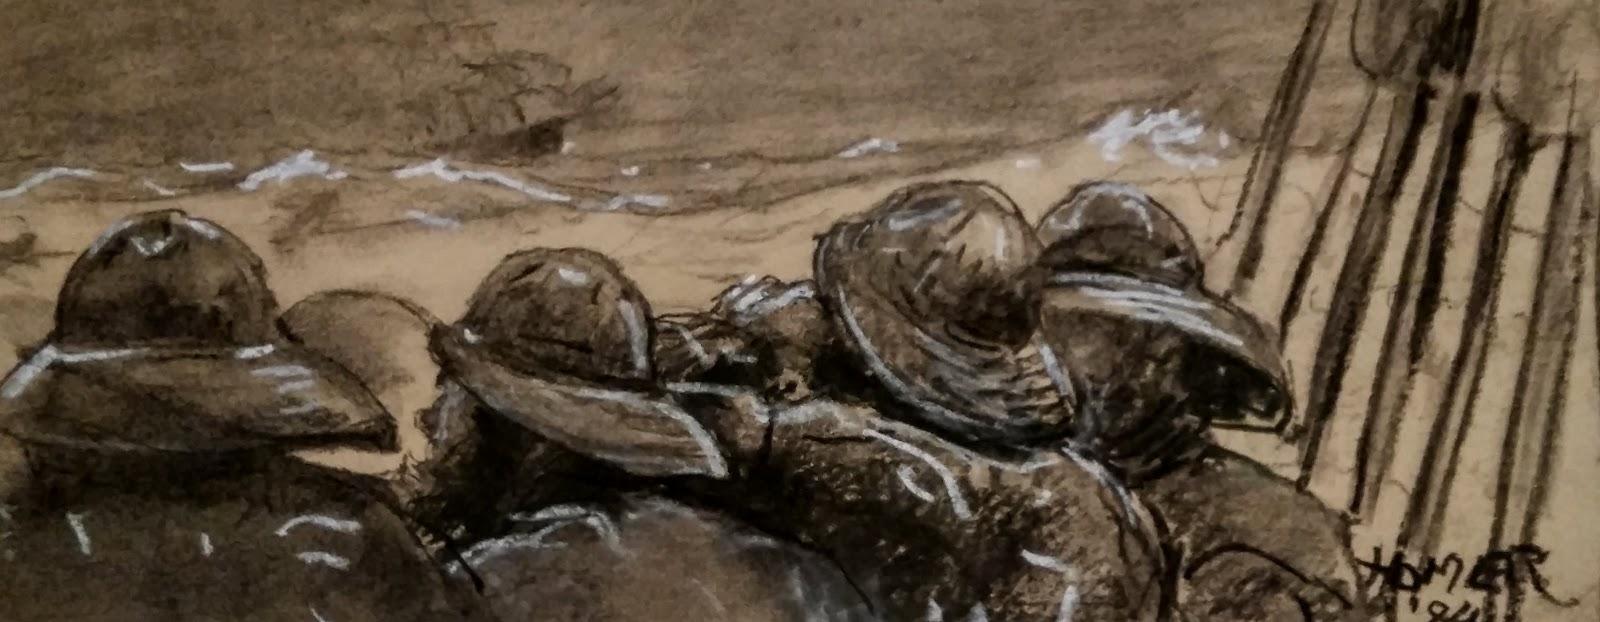 Fisherman Breton In Apron Claude Bils Watercolour